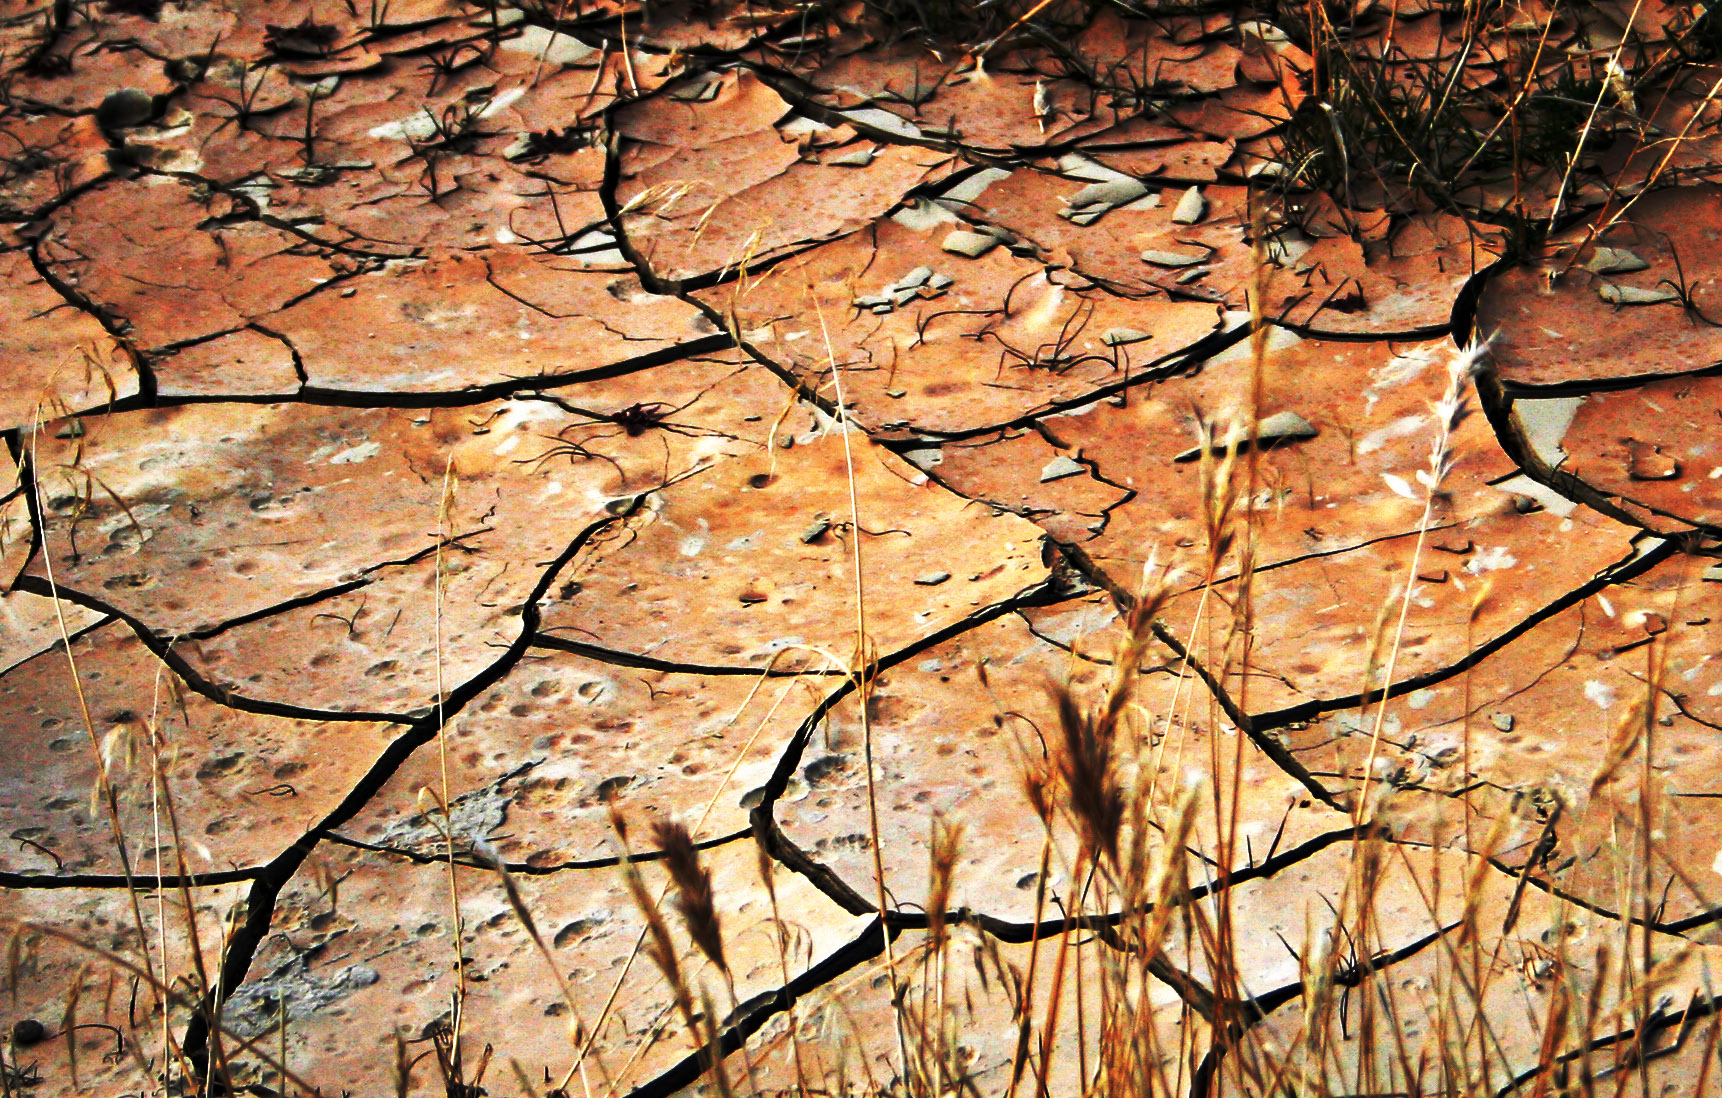 Short essay on drought